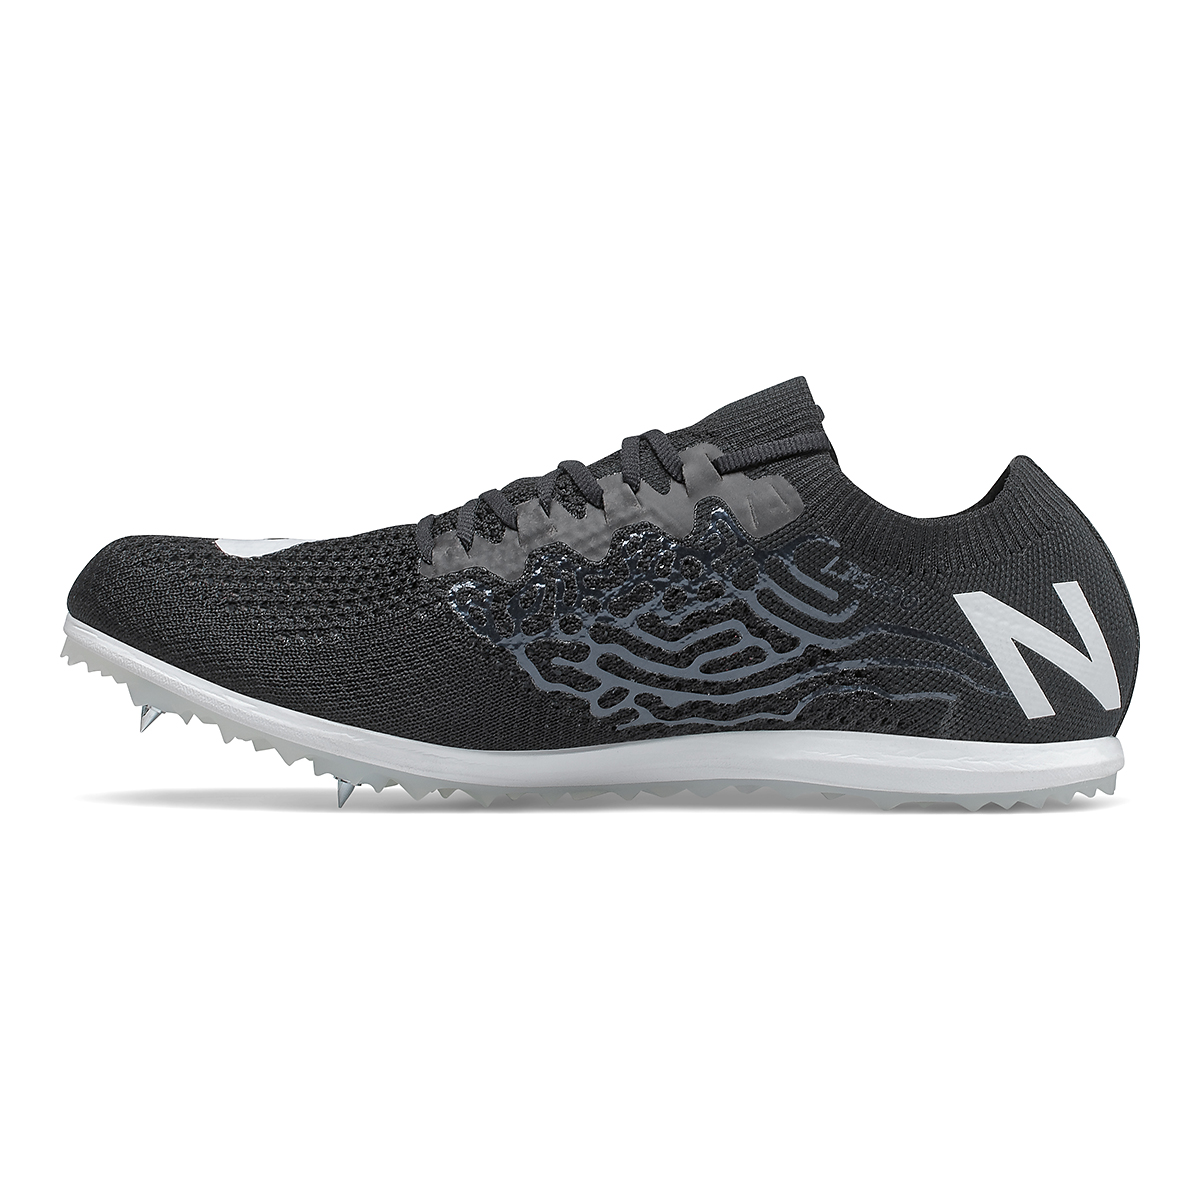 Women's New Balance LD5Kv8 Track Spikes - Color: Black/White - Size: 6 - Width: Regular, Black/White, large, image 2